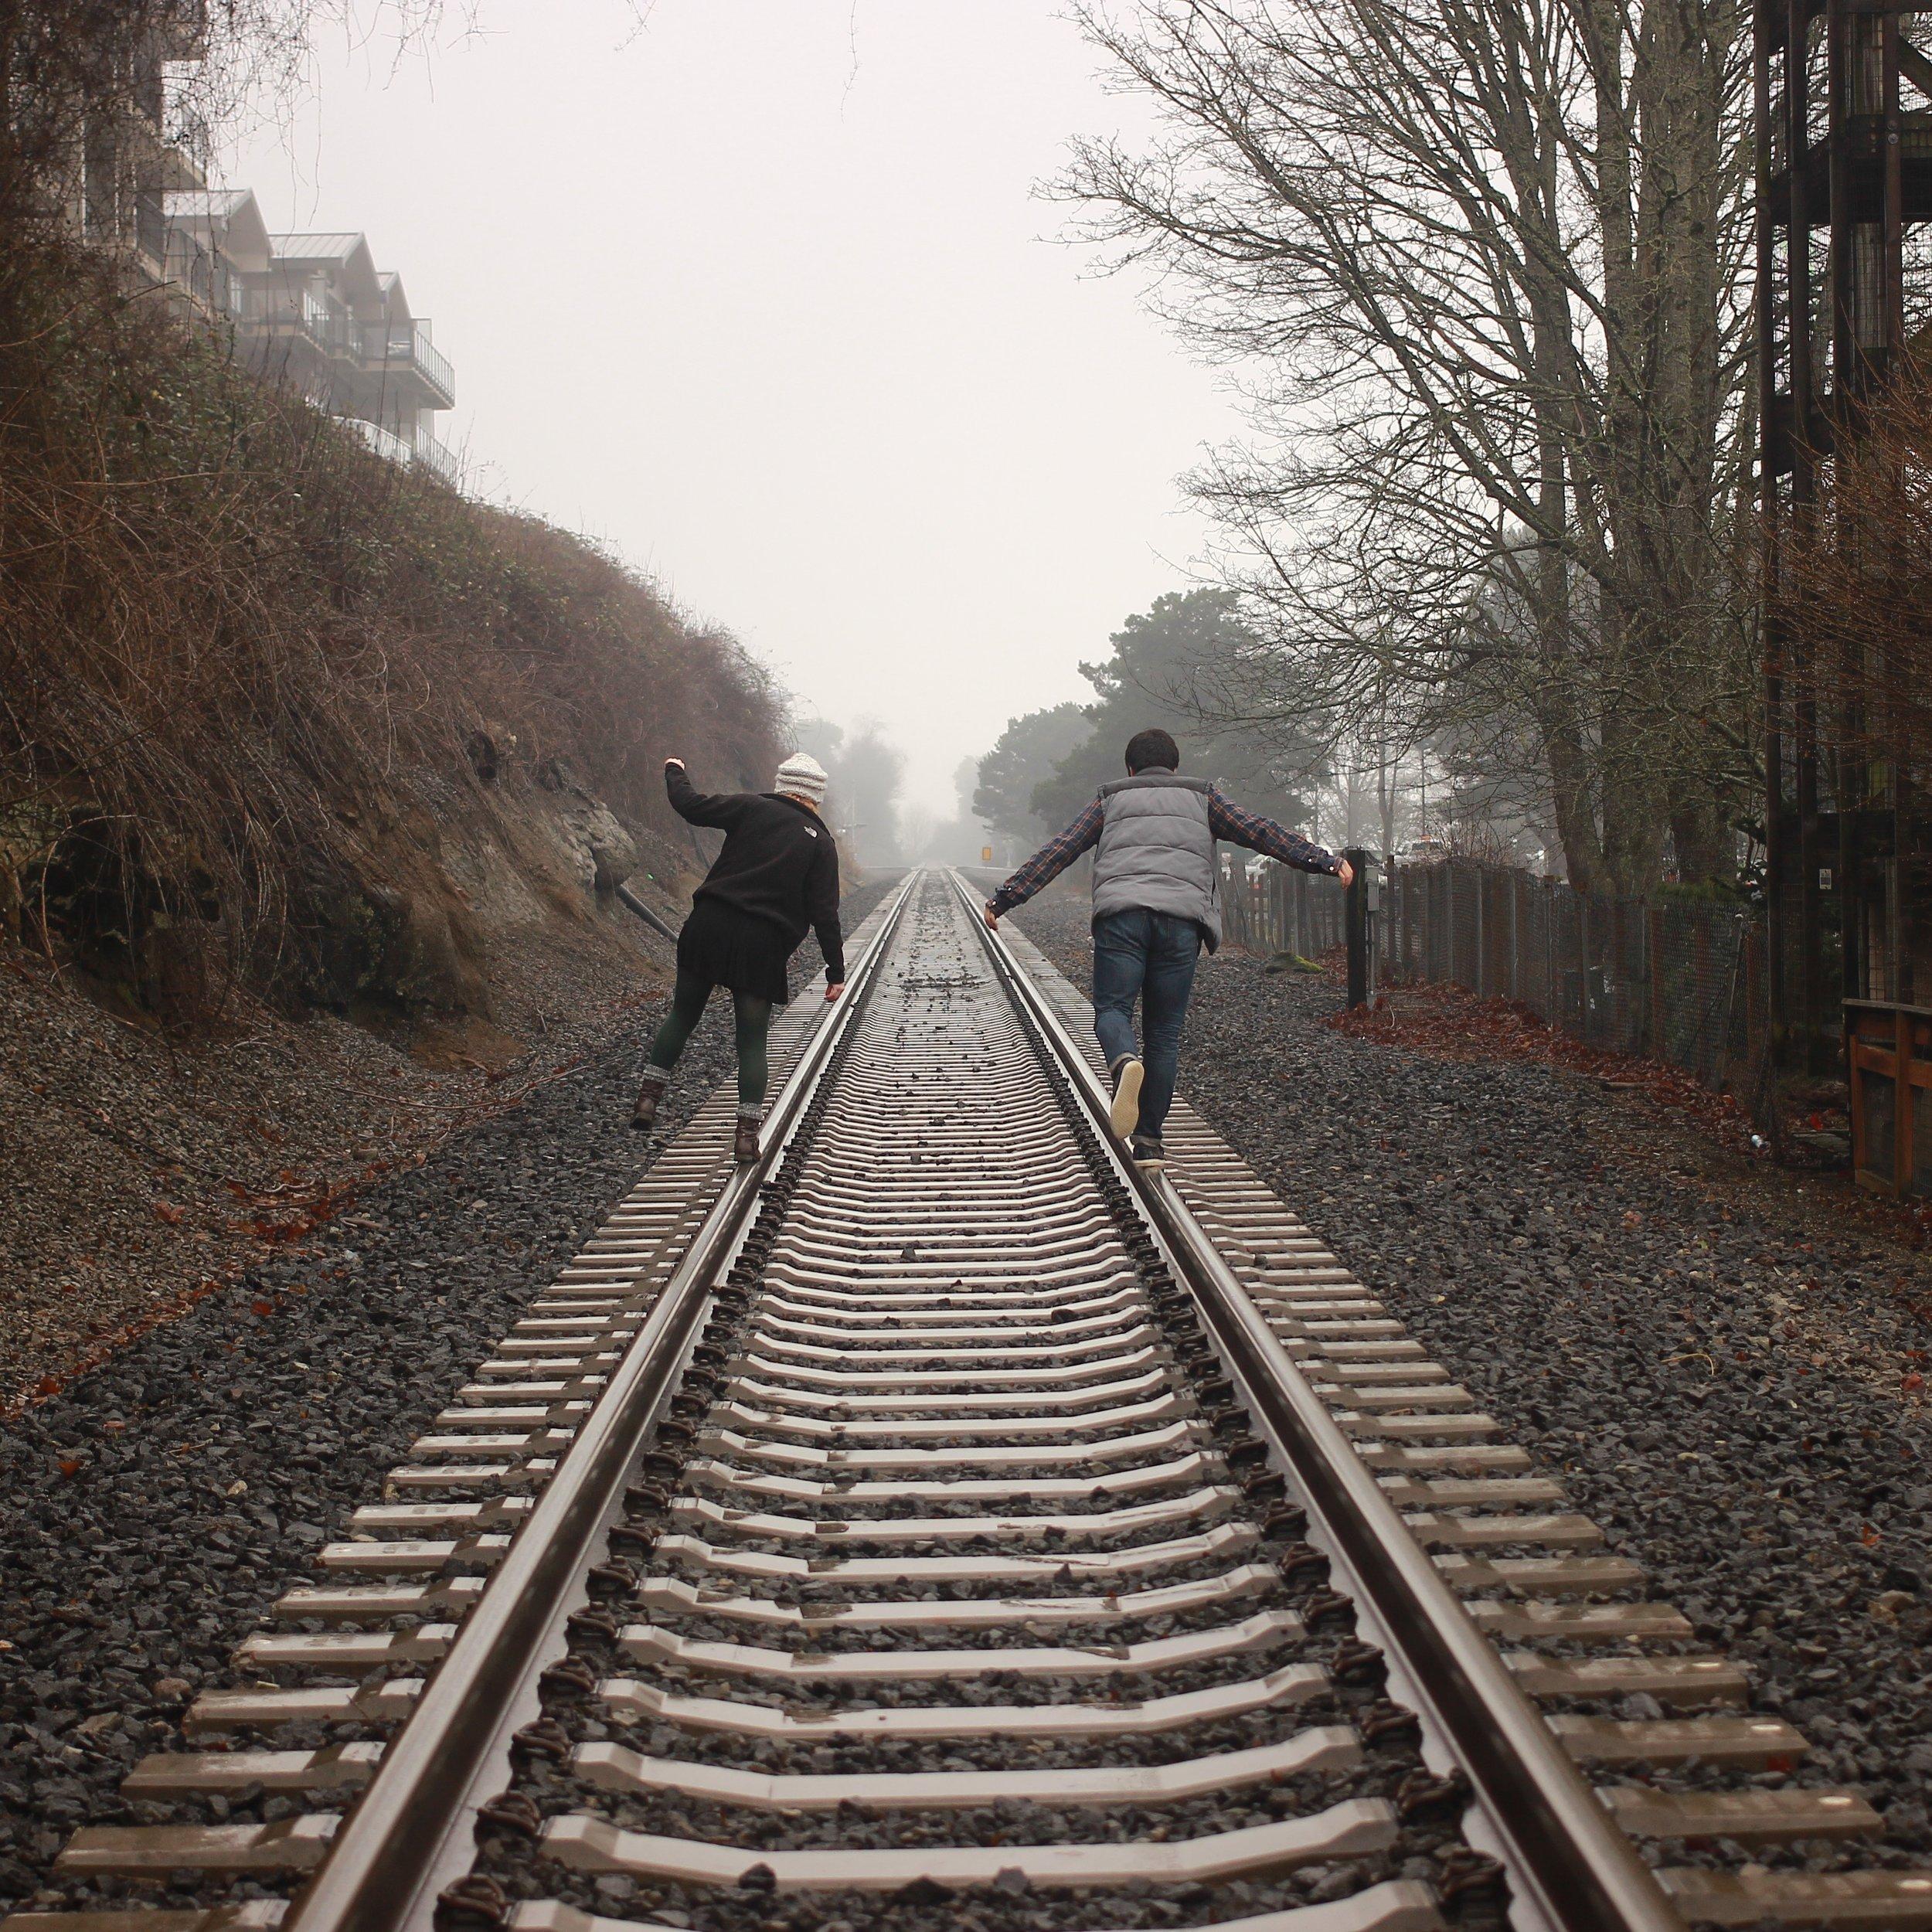 friends_Traintrack.jpg